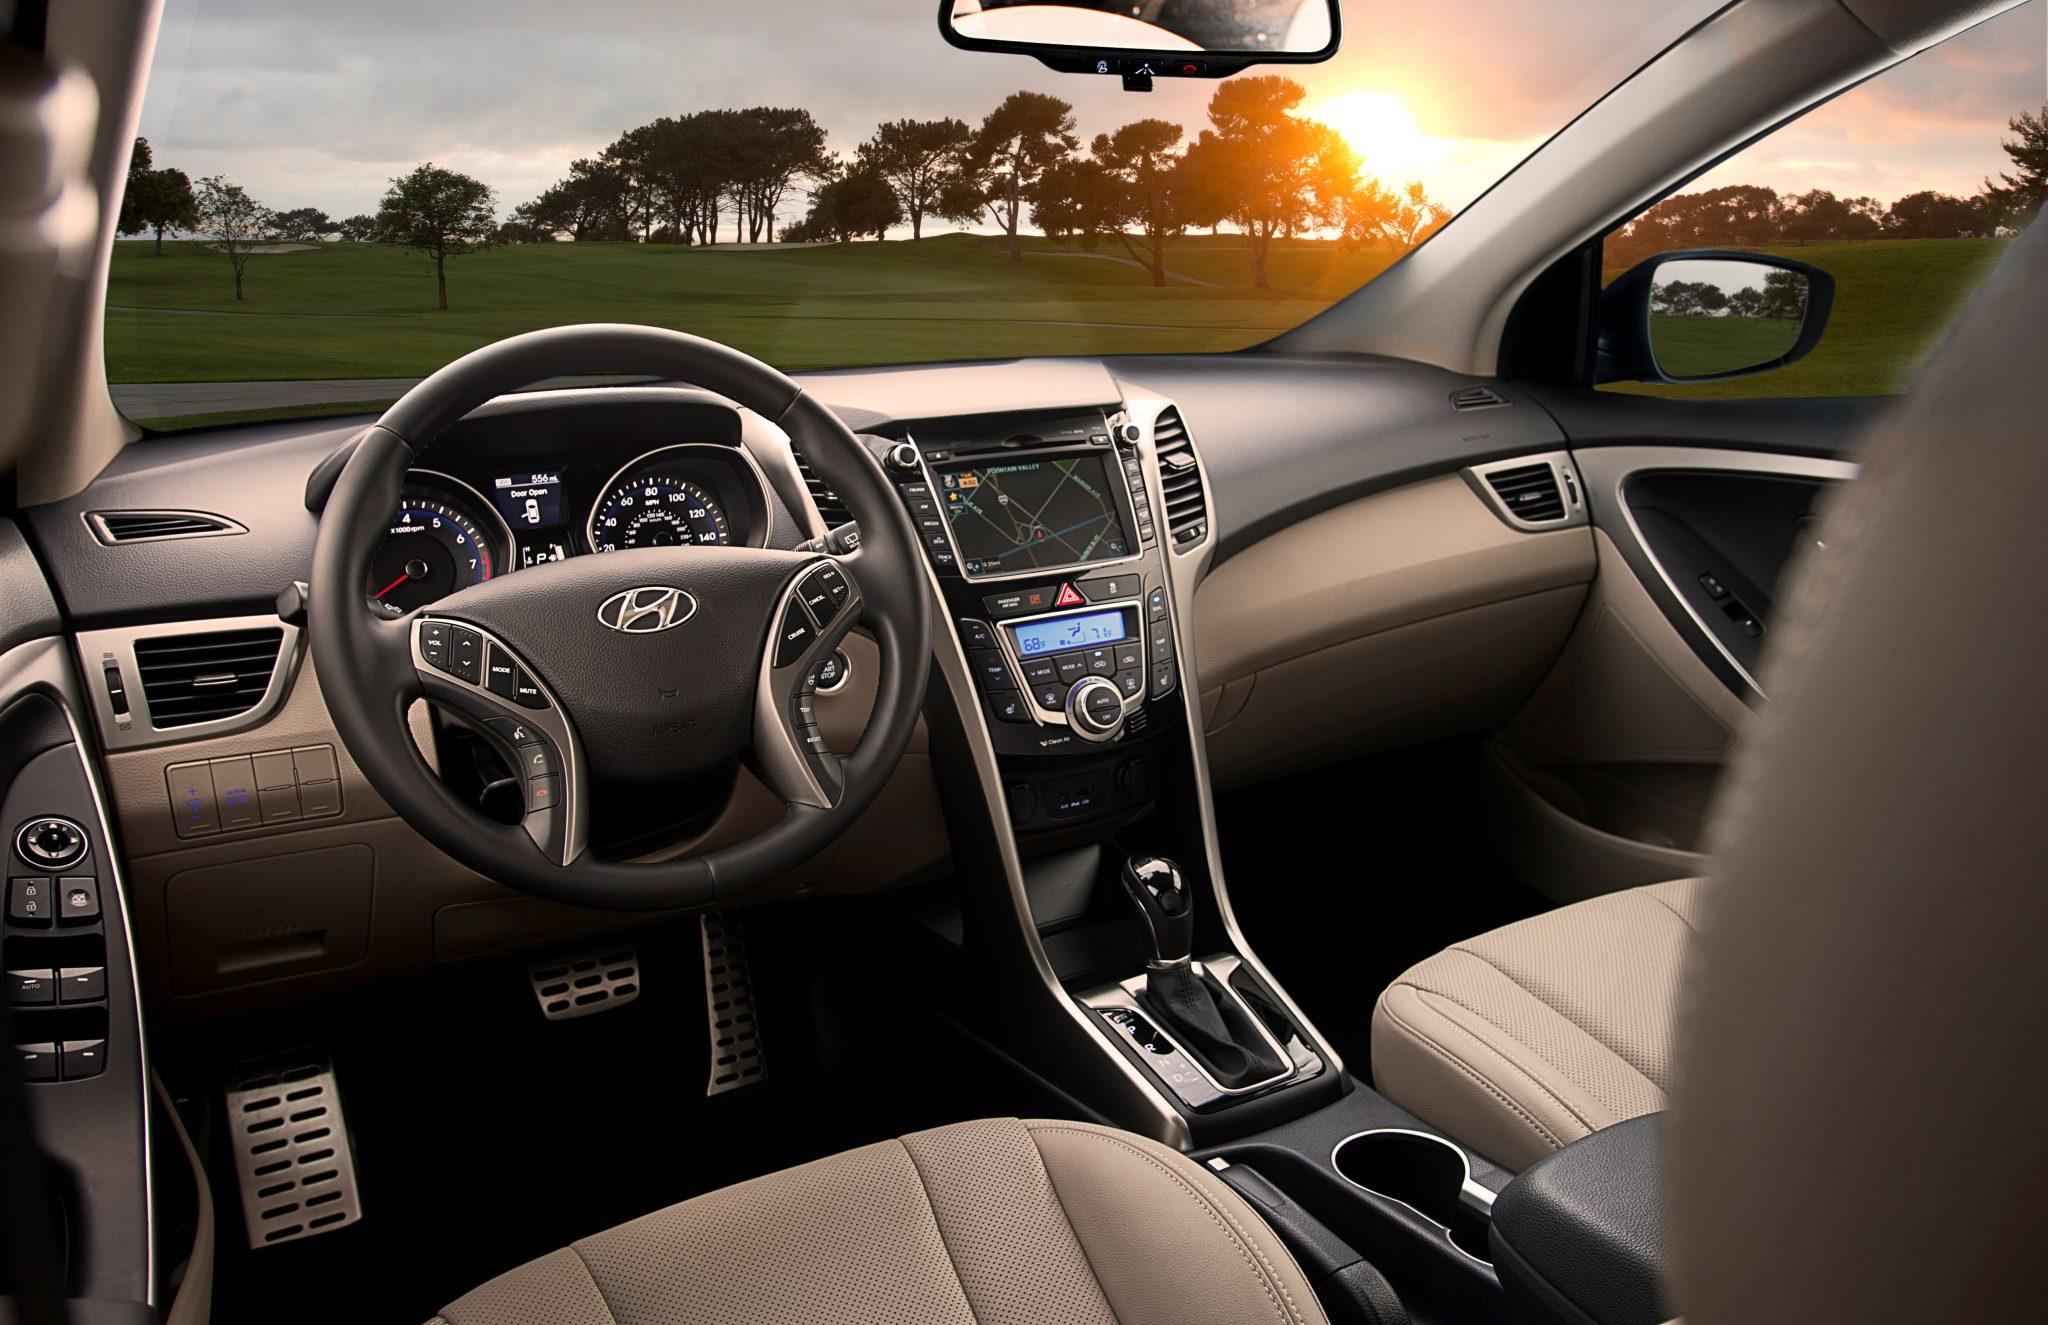 2013 Hyundai Elantra Gt Overview The News Wheel